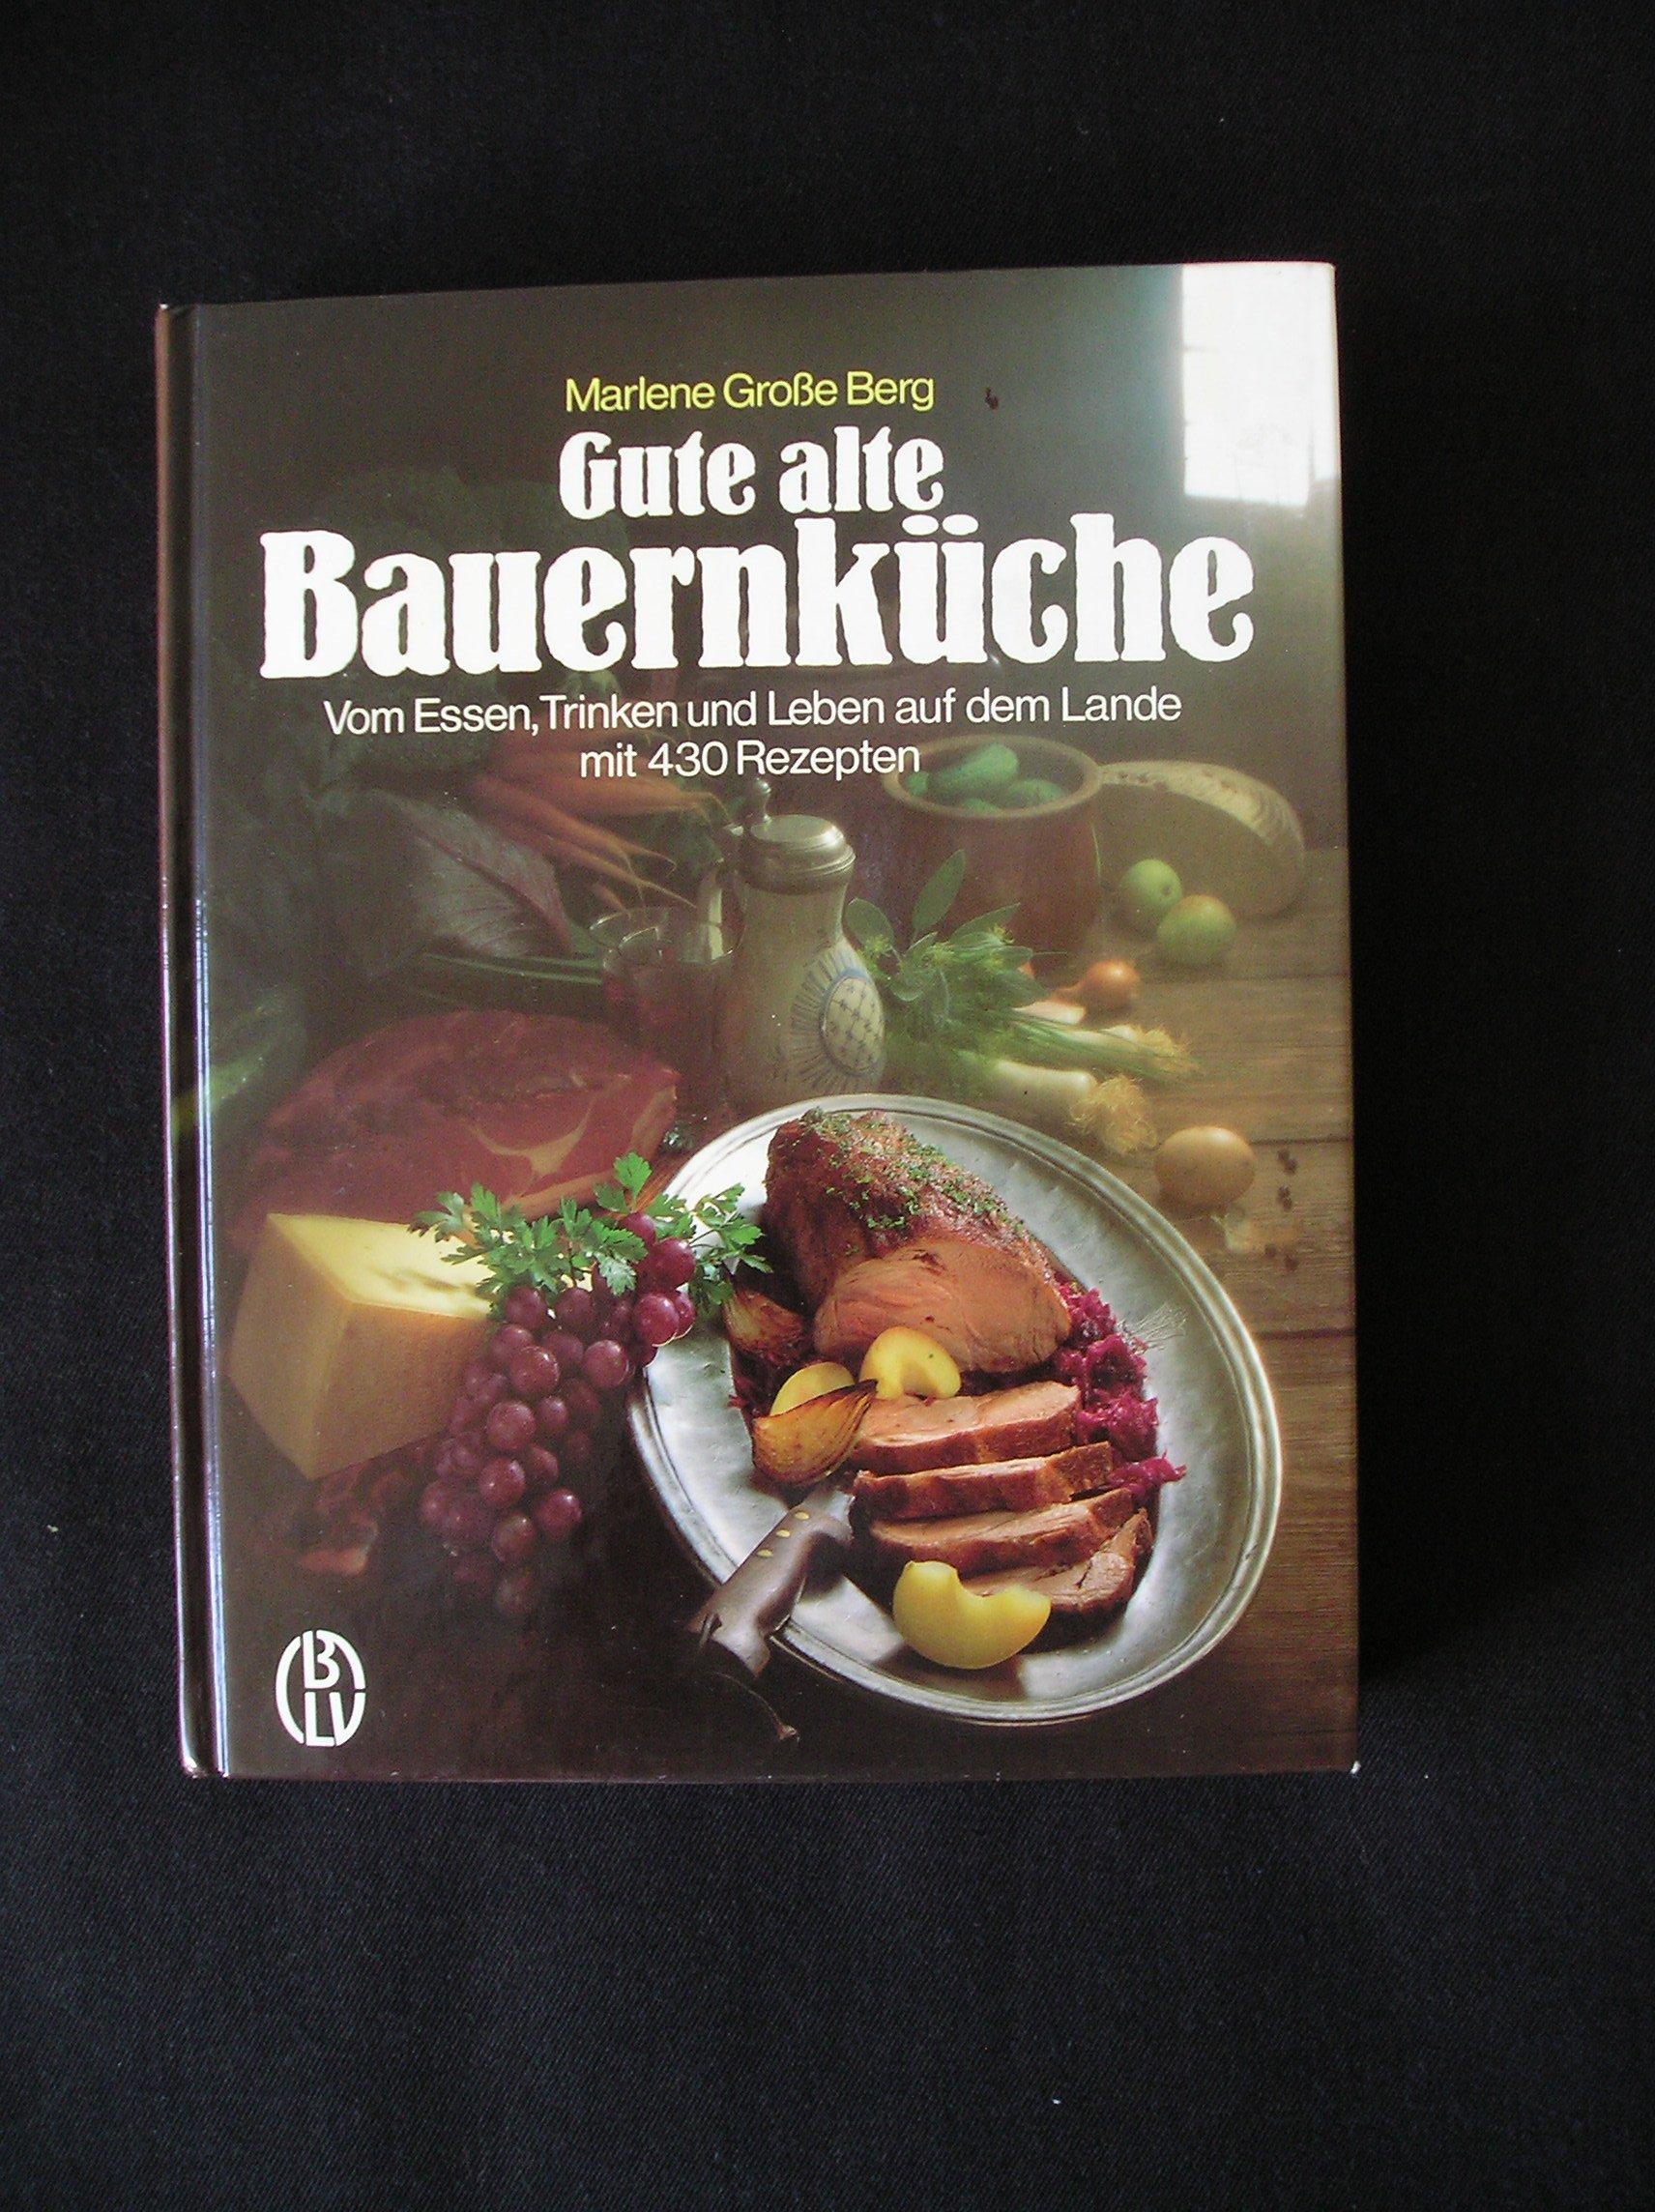 Beste Bauernküche Beleuchtung Galerie - Küche Set Ideen ...